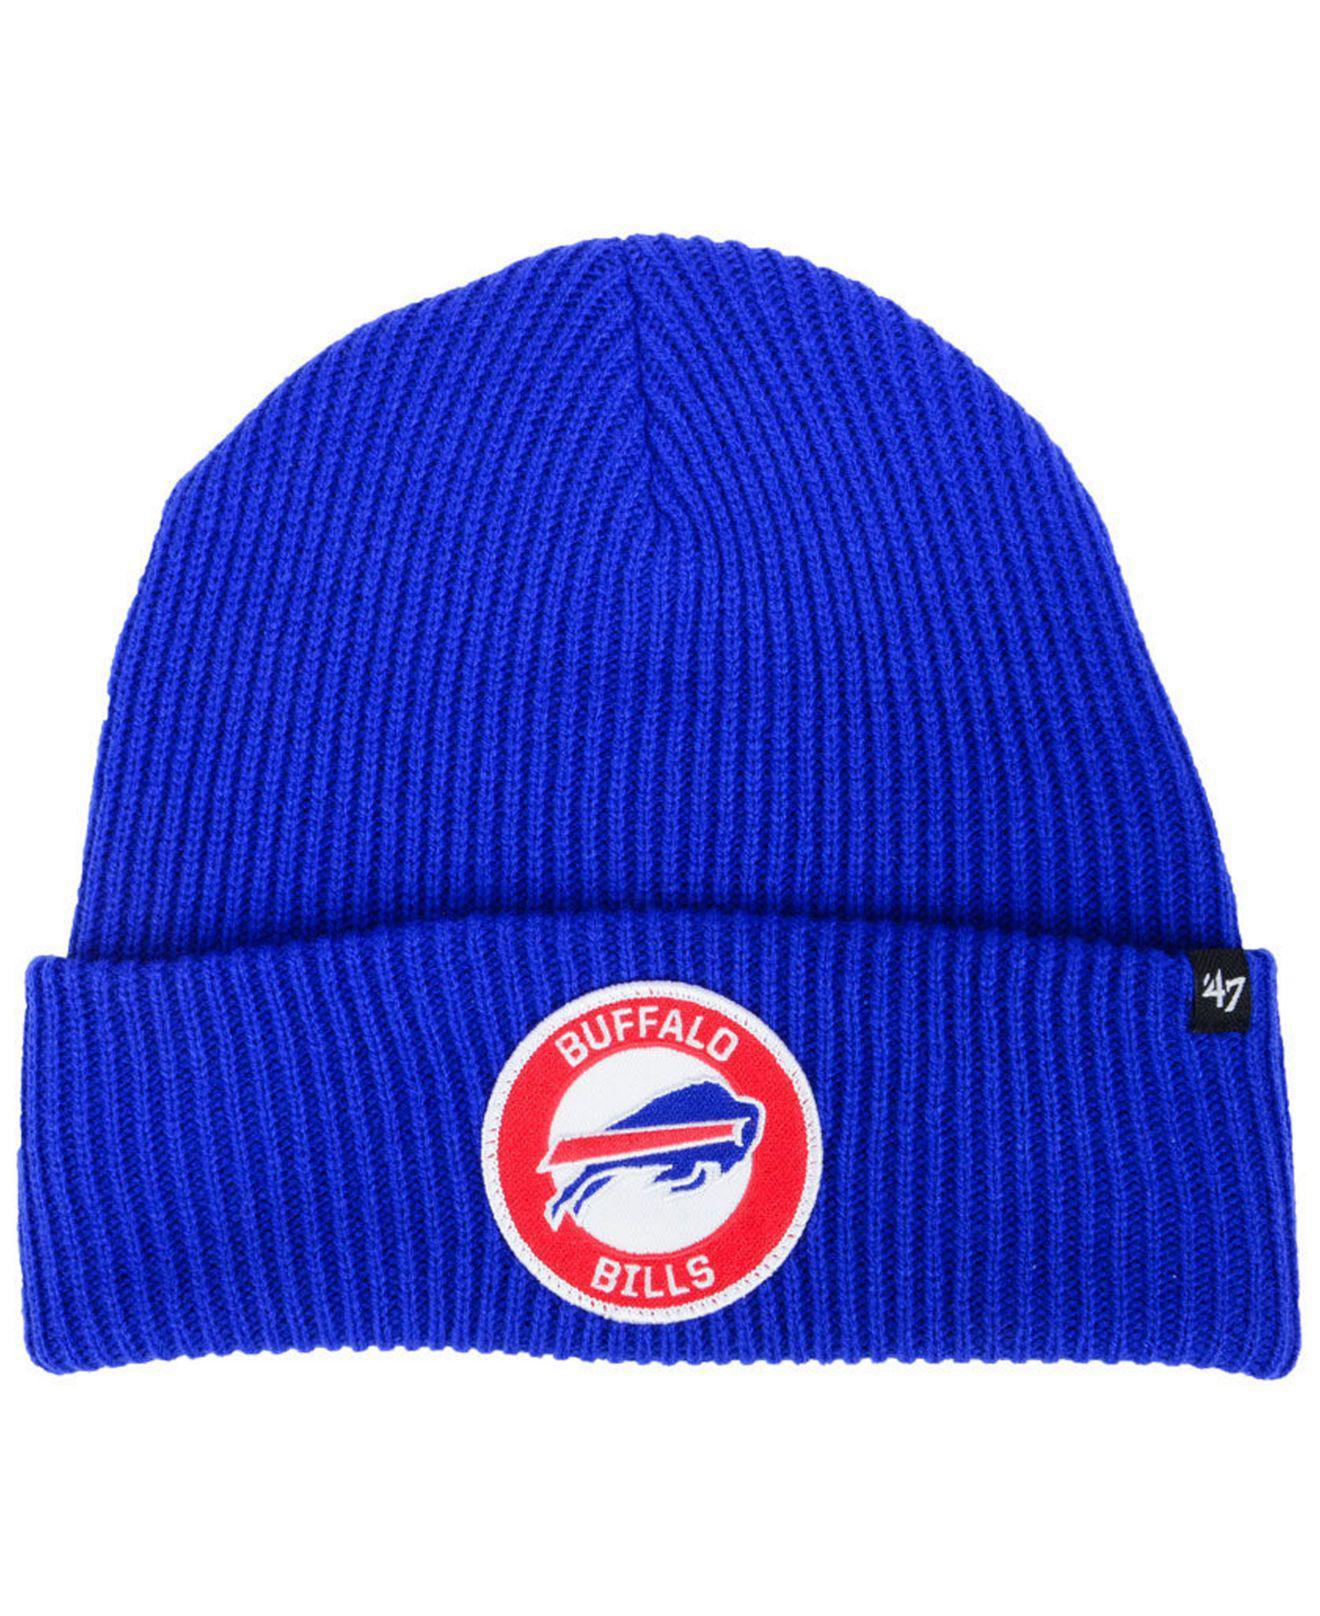 best sneakers fac3e e1202 ... canada lyst 47 brand buffalo bills ice block cuff knit hat in blue for  men 7c21f